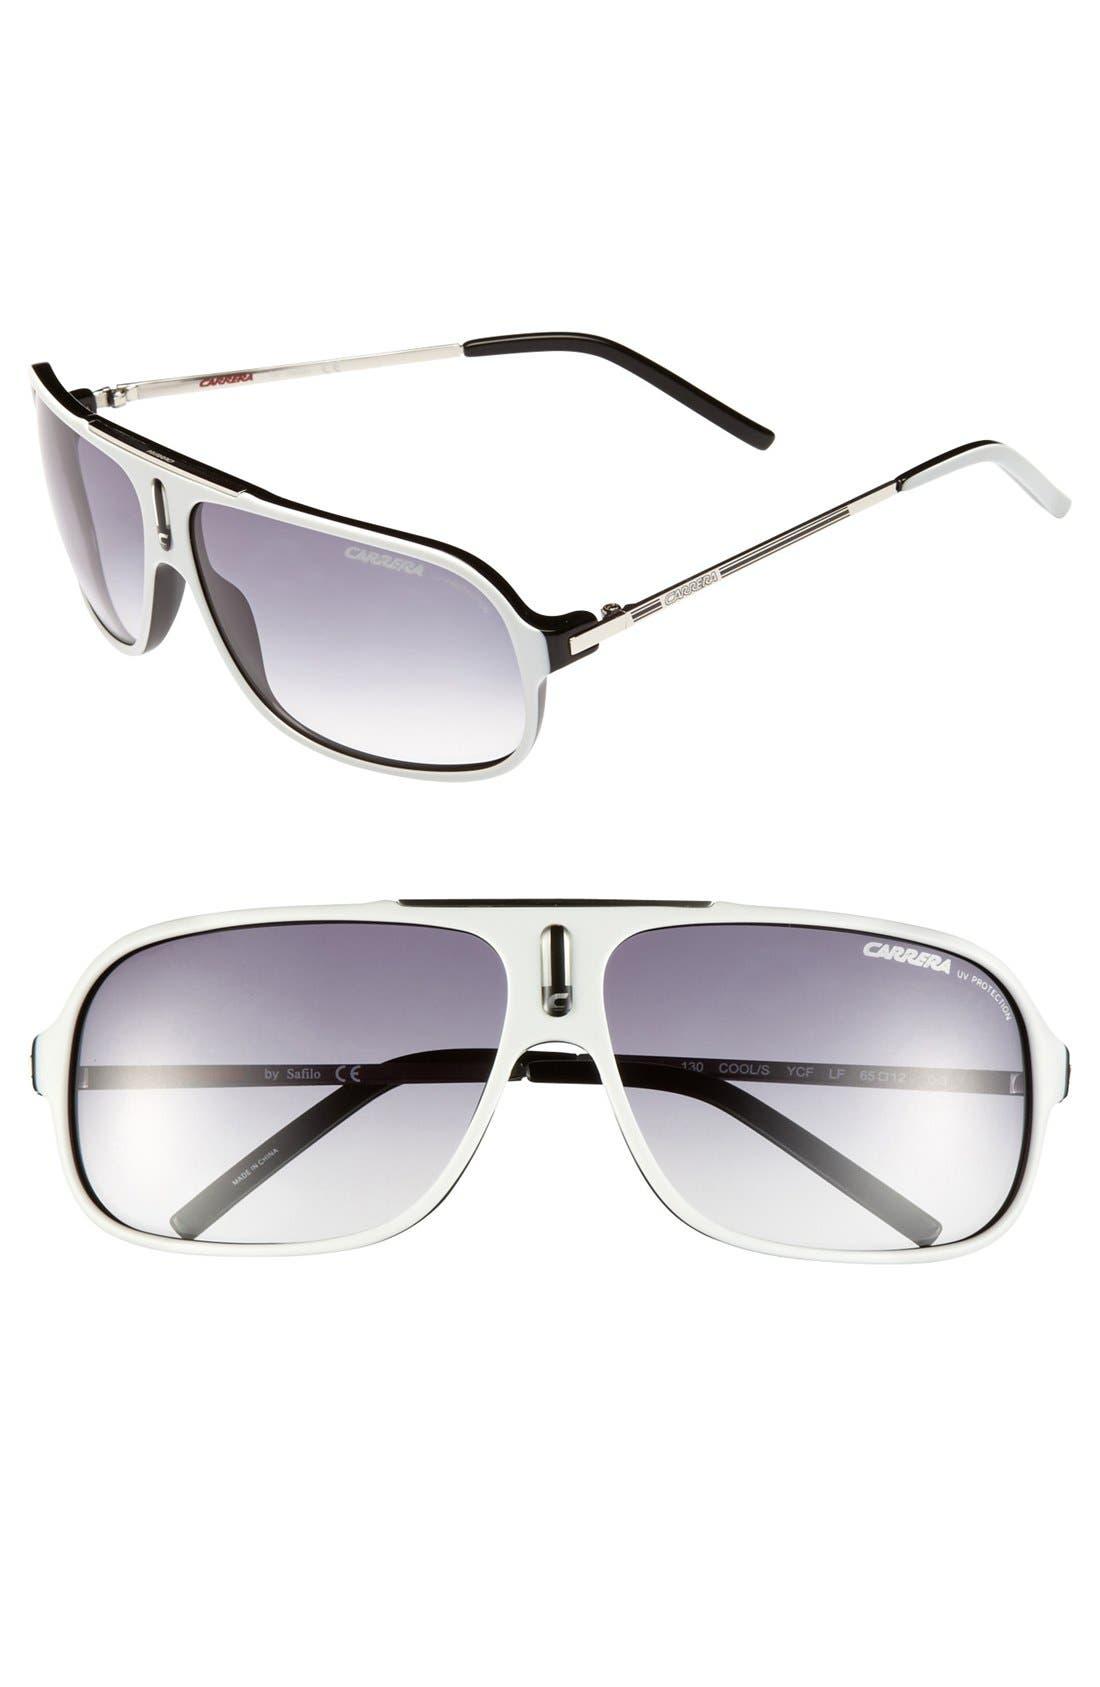 Alternate Image 1 Selected - Carrera Eyewear 'Cool' 61mm Vintage Inspired Aviator Sunglasses